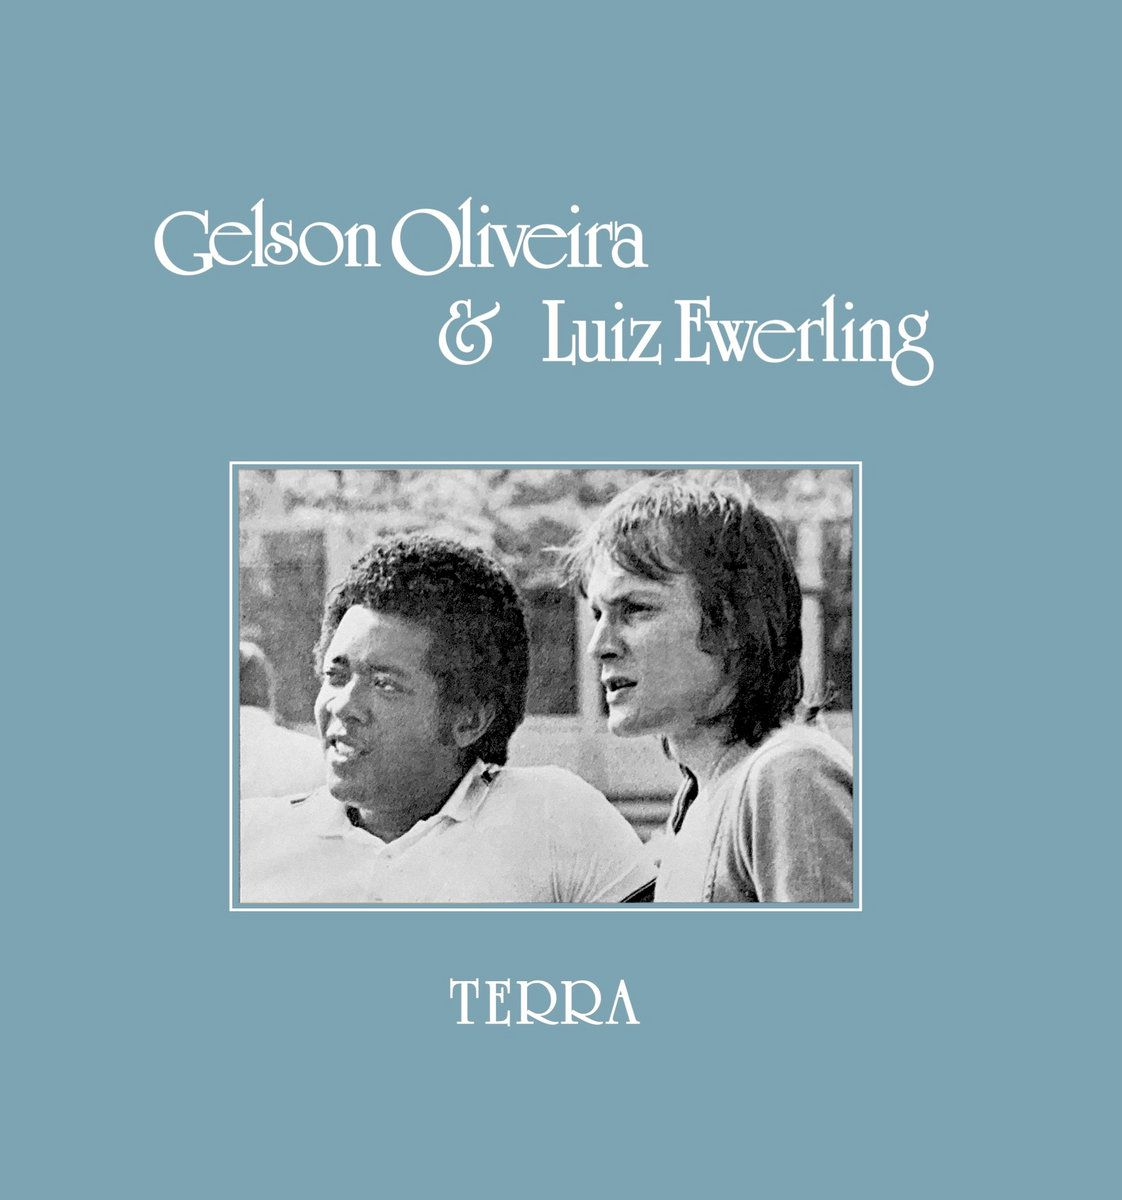 Álbuns com Pó. Na <i>Terra</i> de Gelson Oliveira & Luiz Ewerling